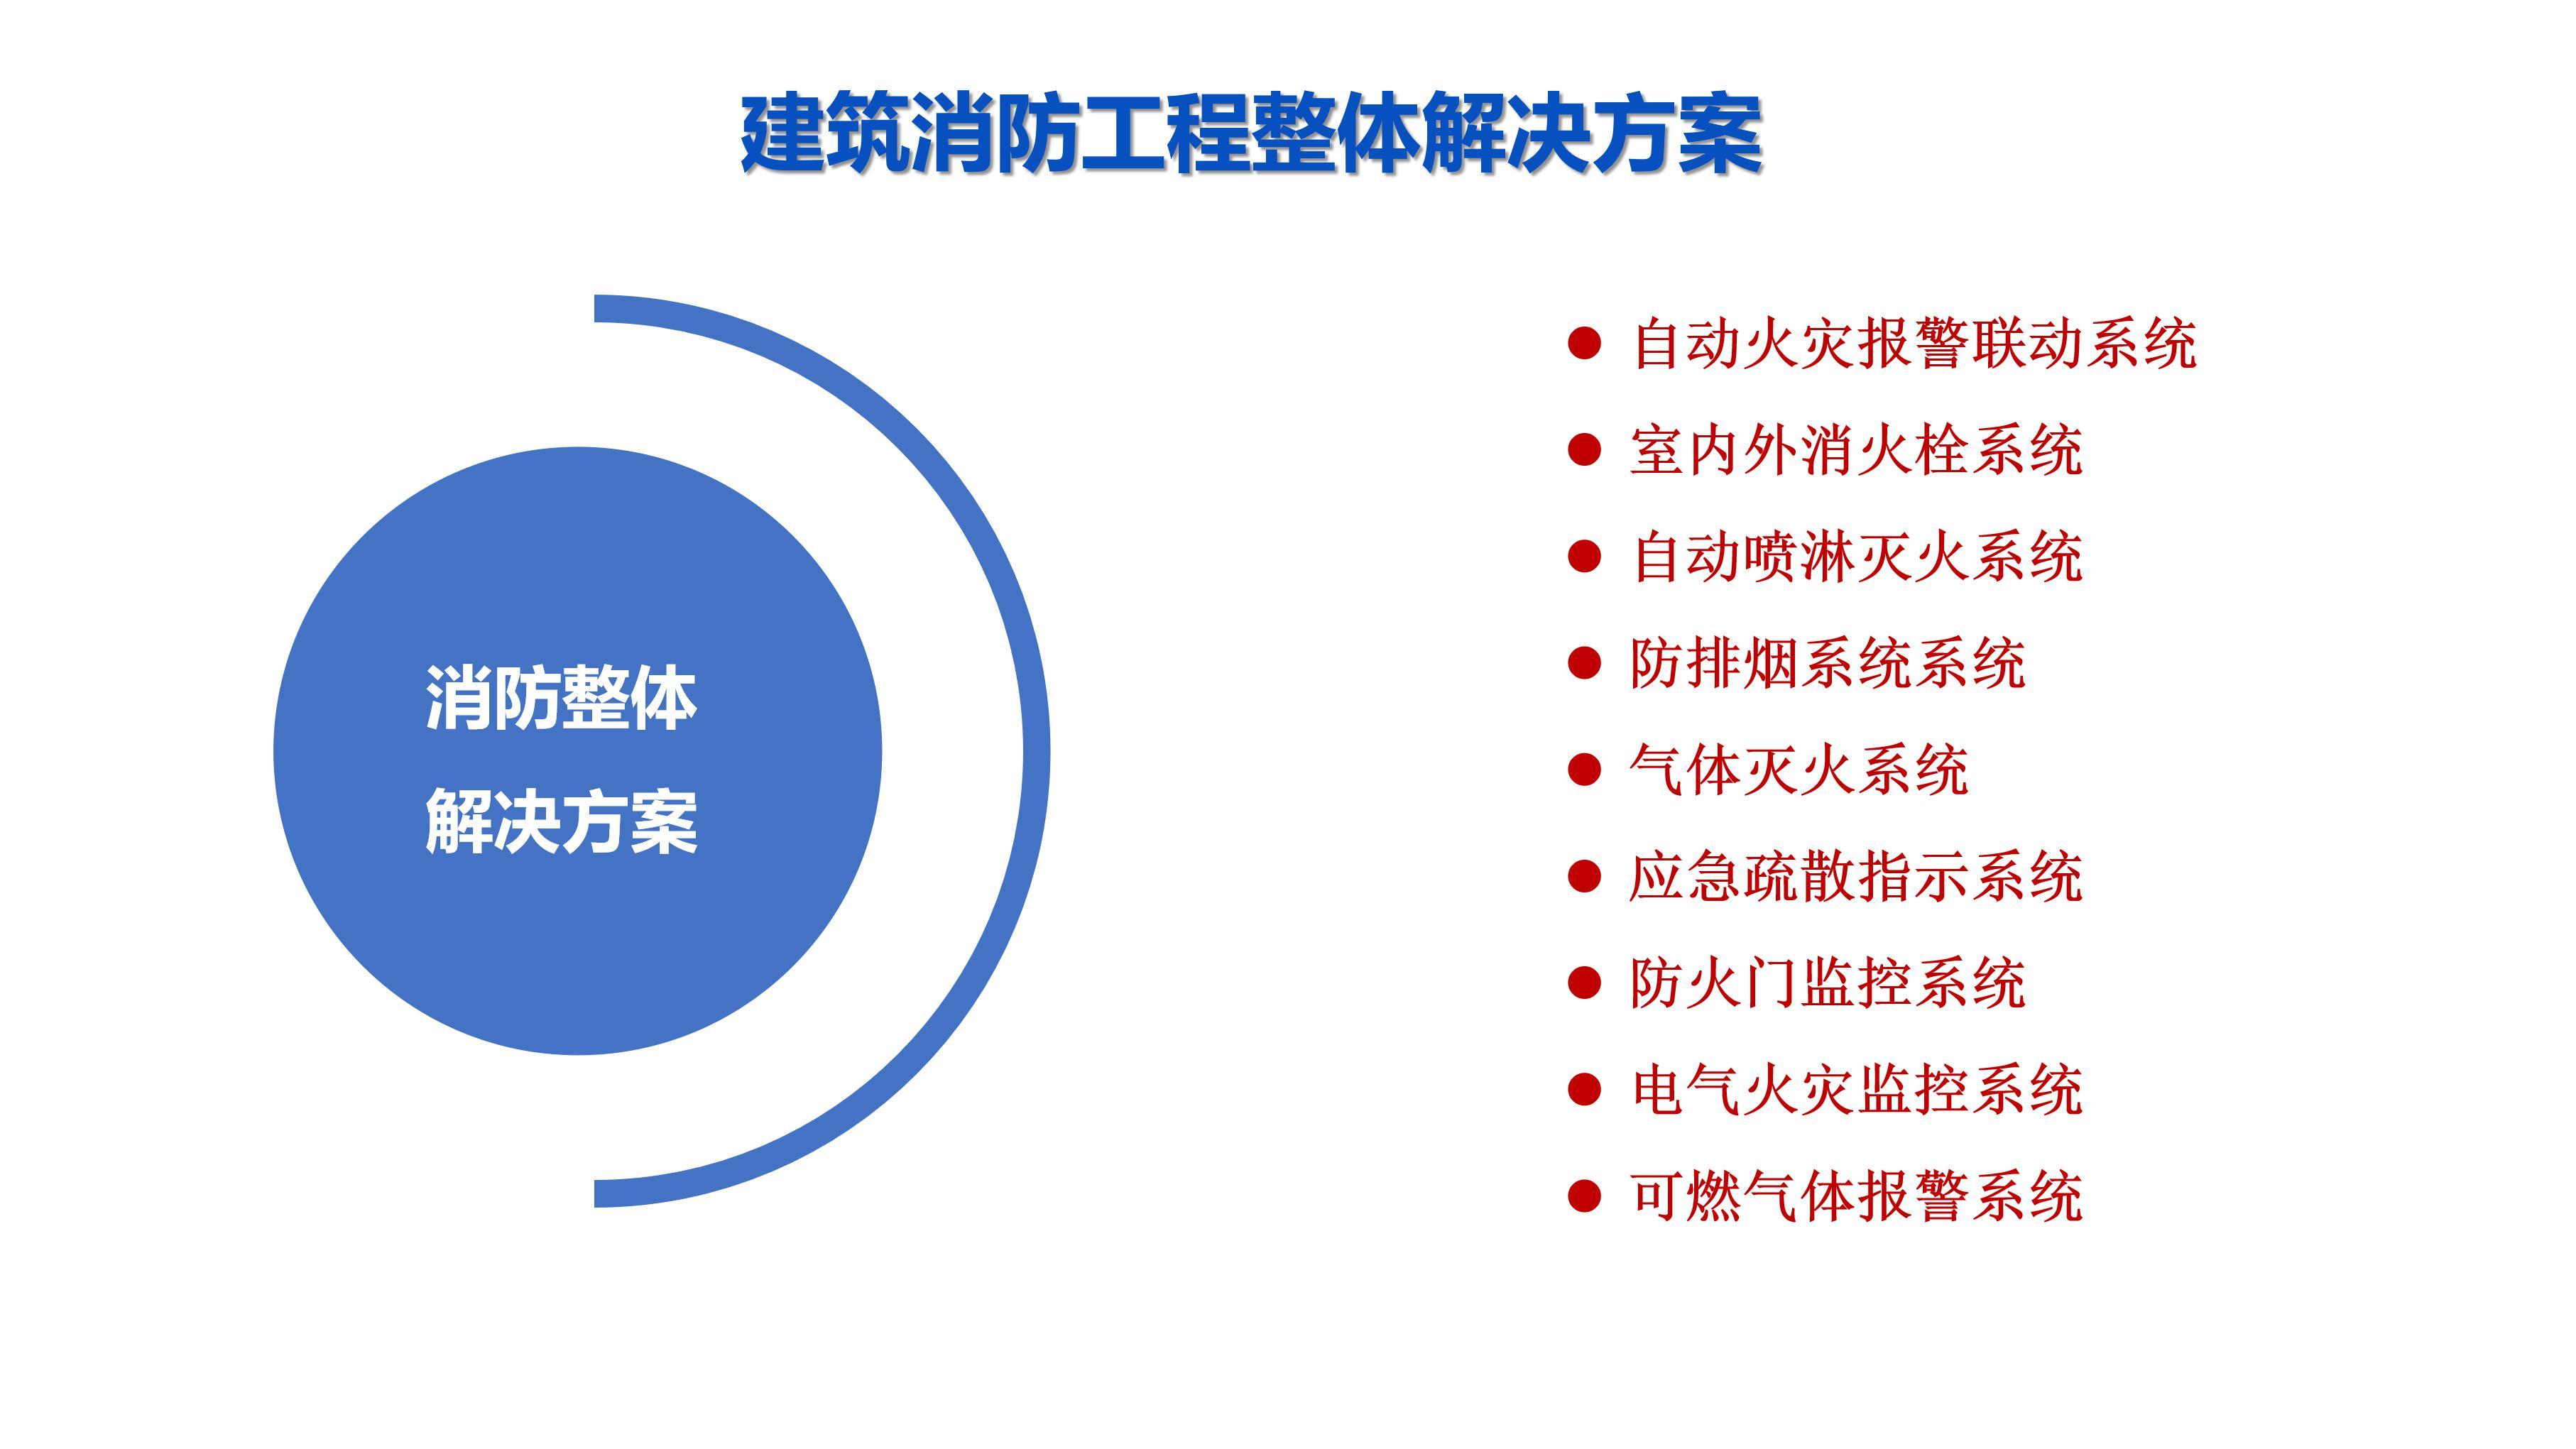 betway体育官网下载设施工程文案_01.jpg